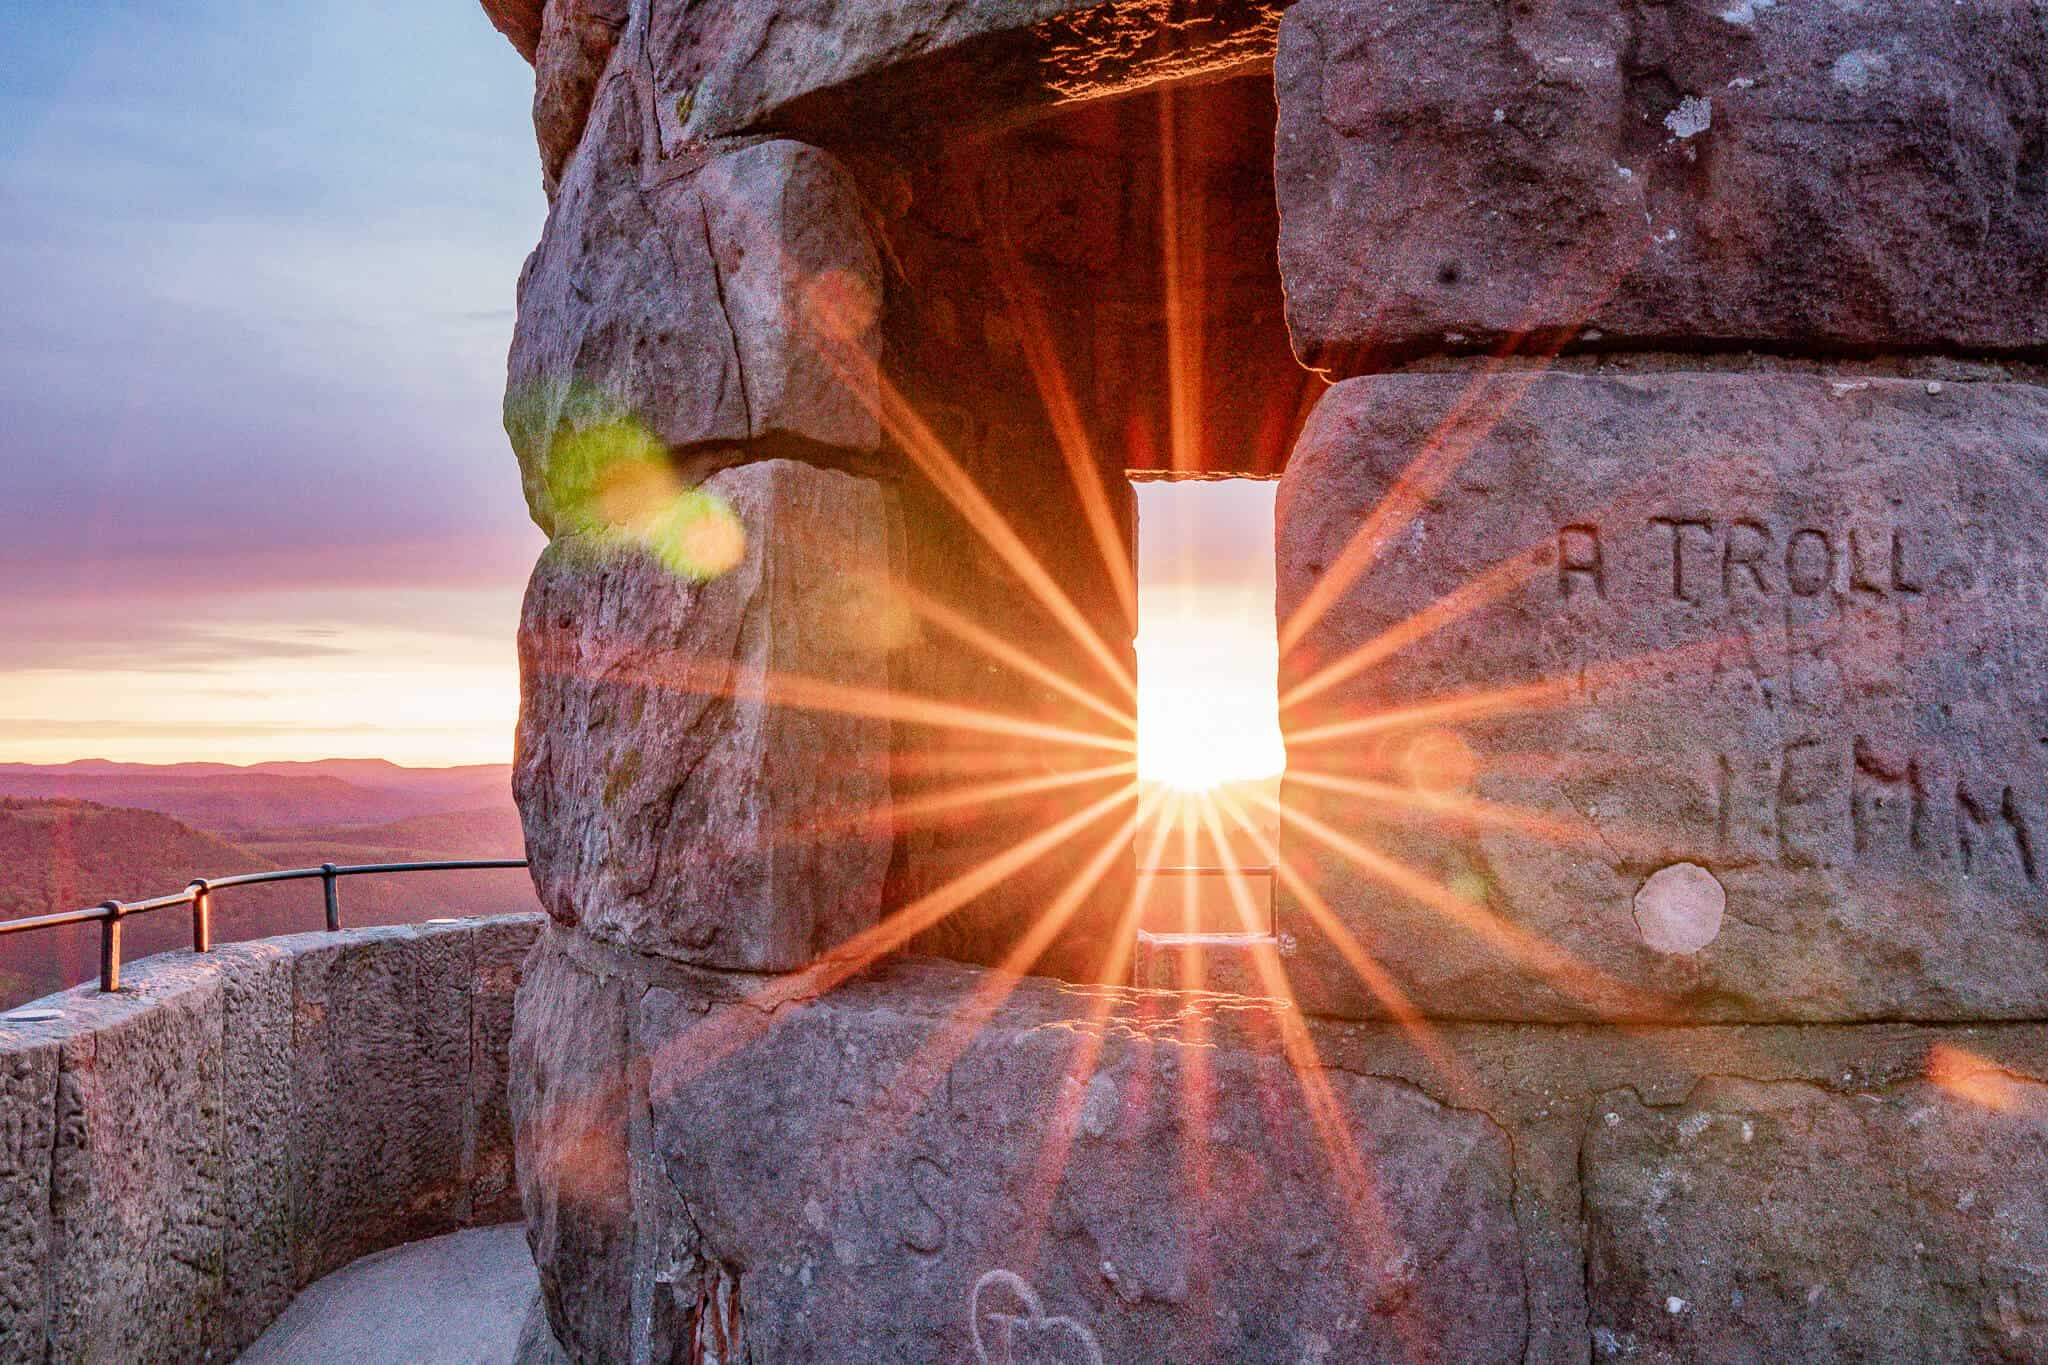 Sonnenaufgang im Pfälzerwald – Sonnenstern Luitpold Turm